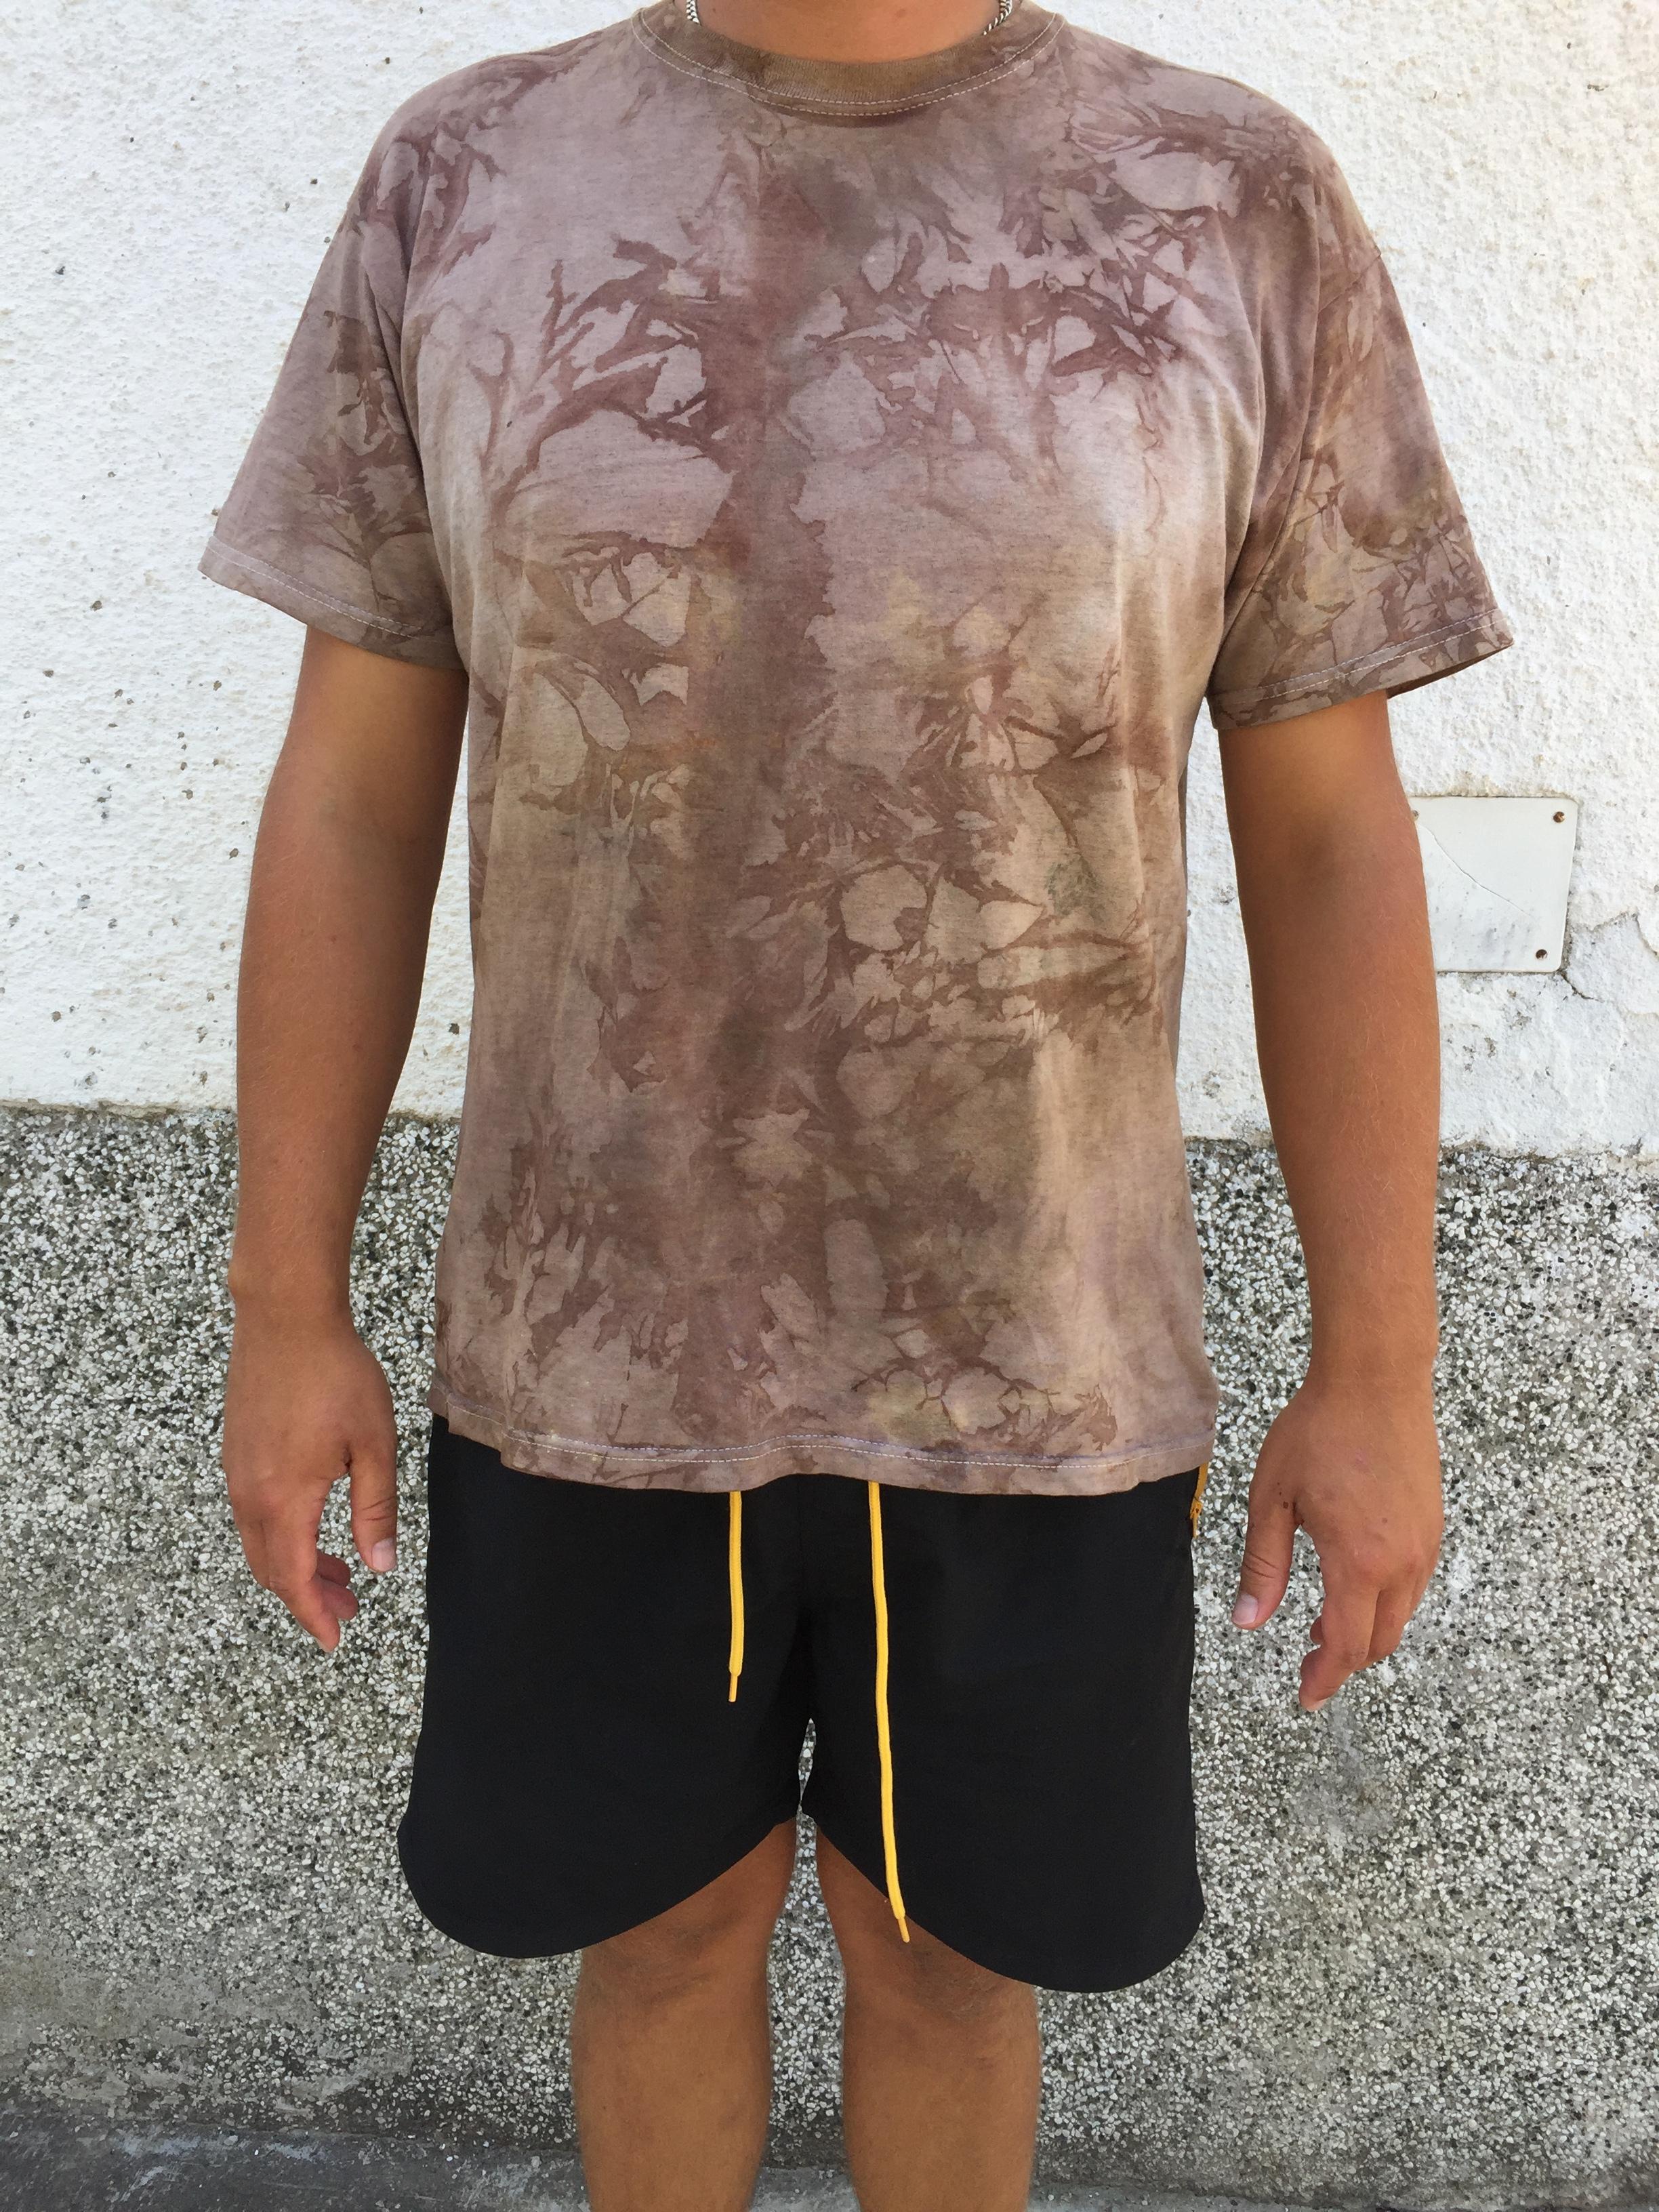 Walnut Dye on T-shirt - Substantive dye